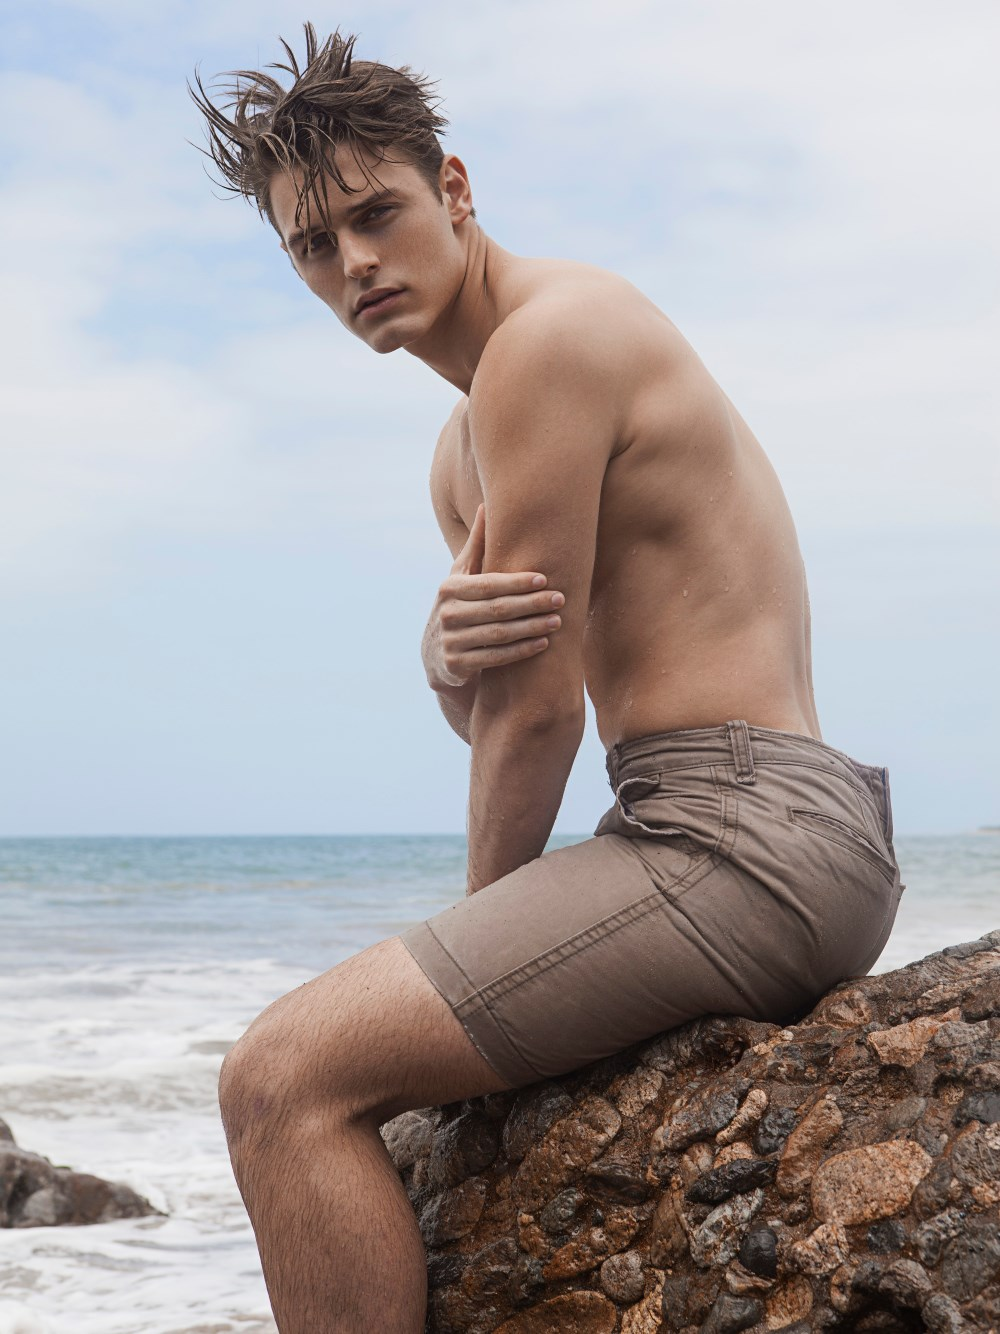 James mason naked